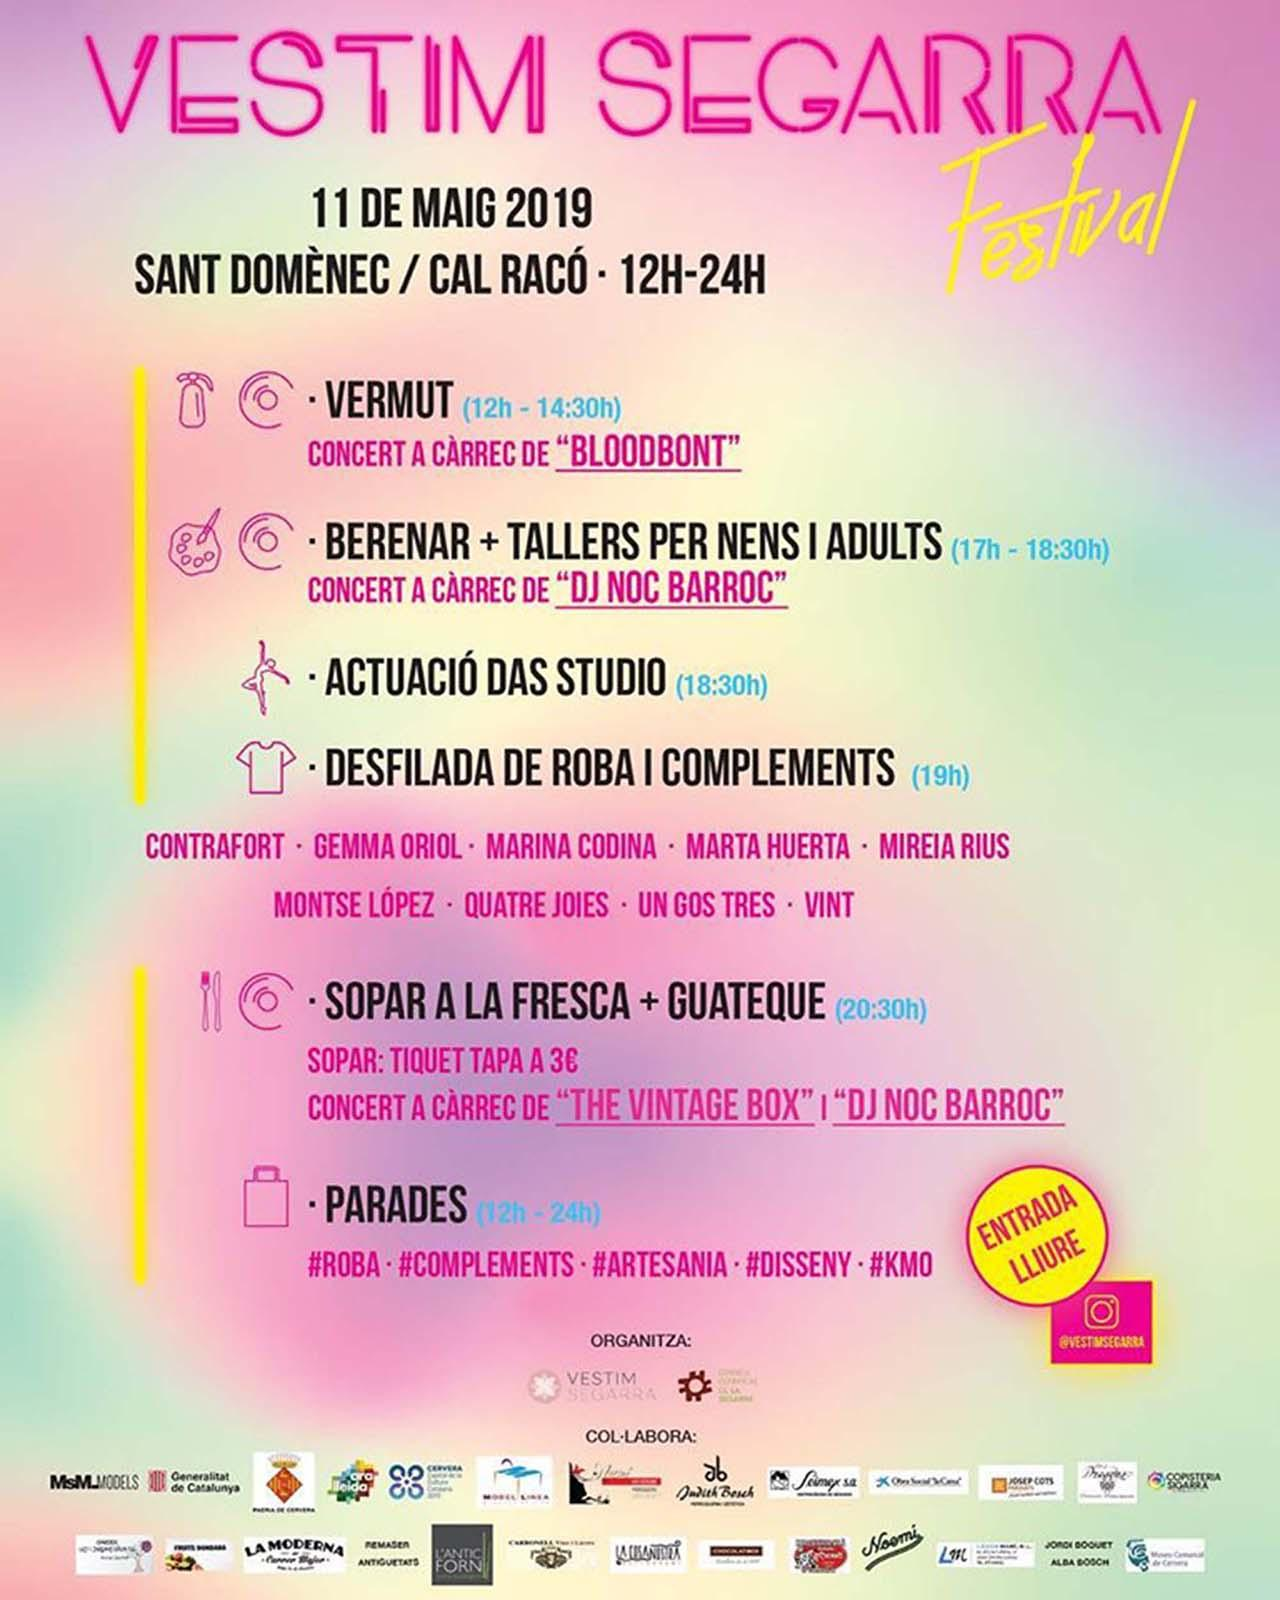 Vestim Segarra festival 2019